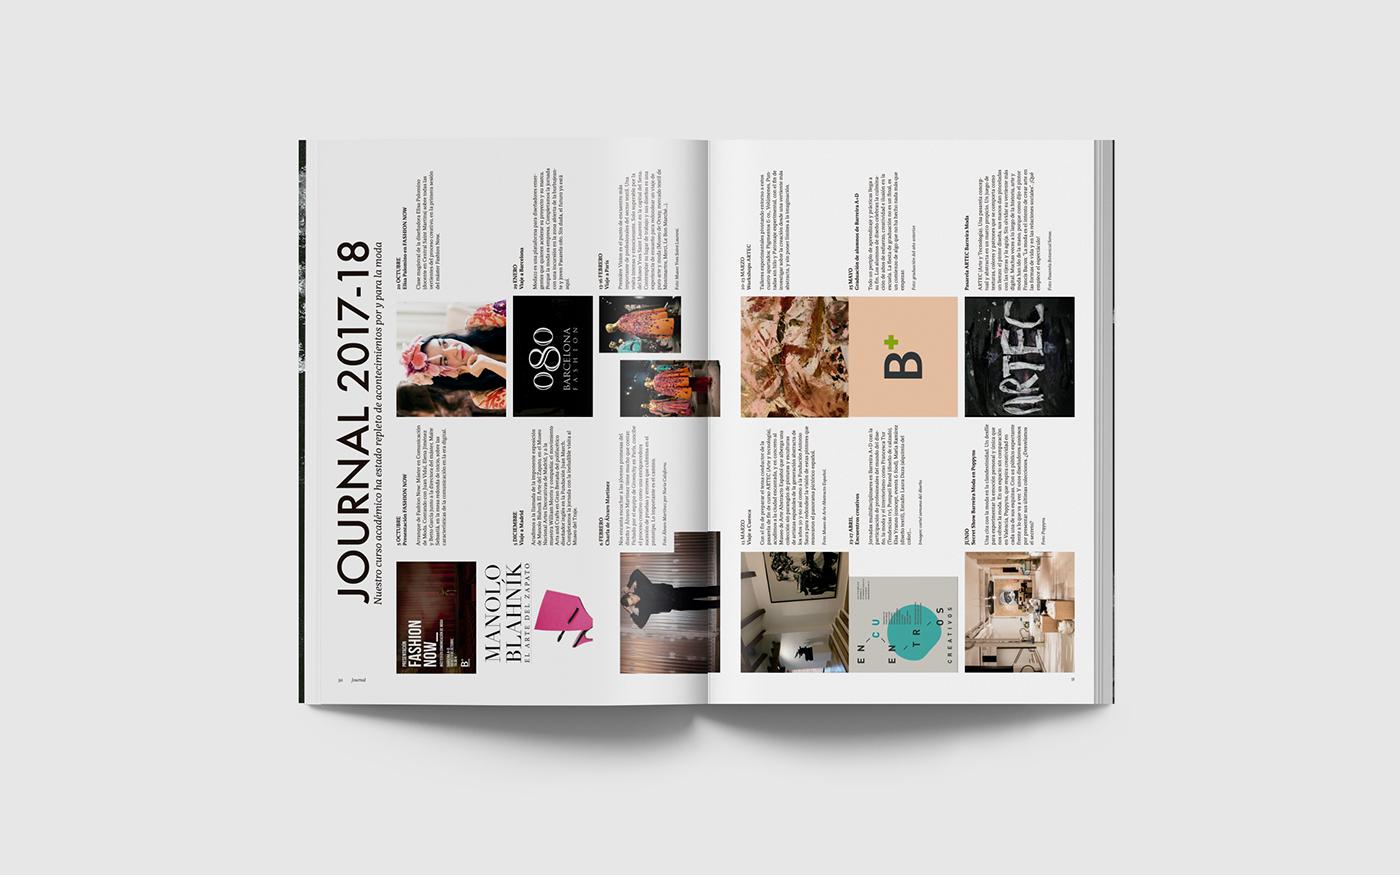 Diseño editorial moda revista editorial barreira bies